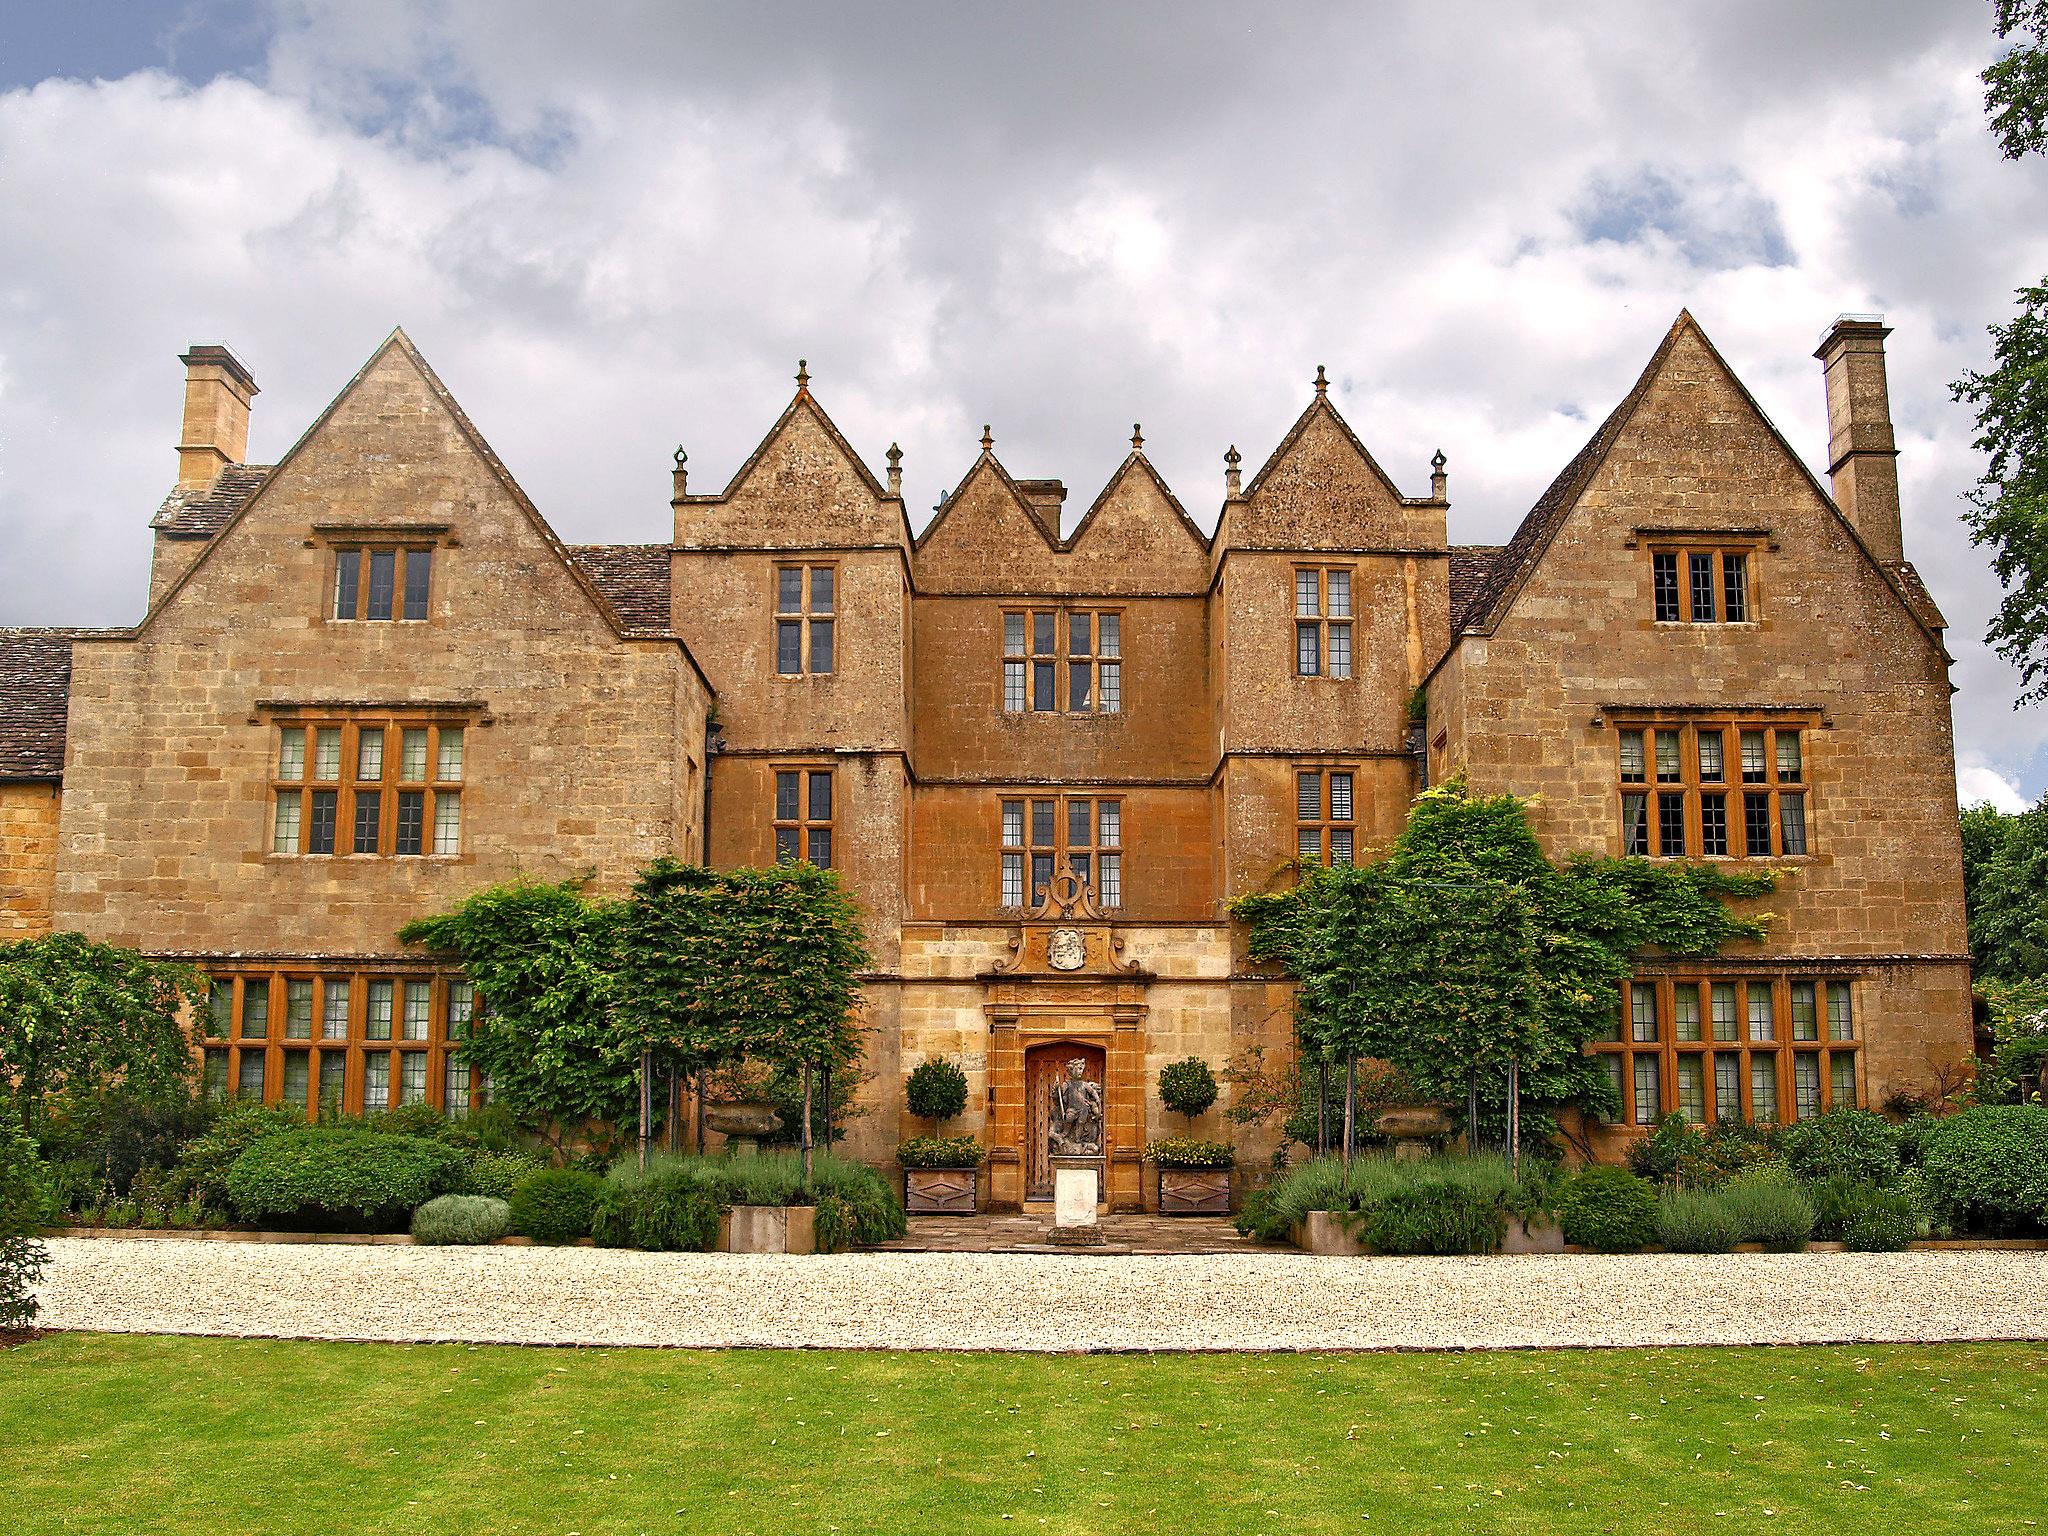 Stanton Court, Stanton, Gloucestershire by Andrew S Brown.jpg